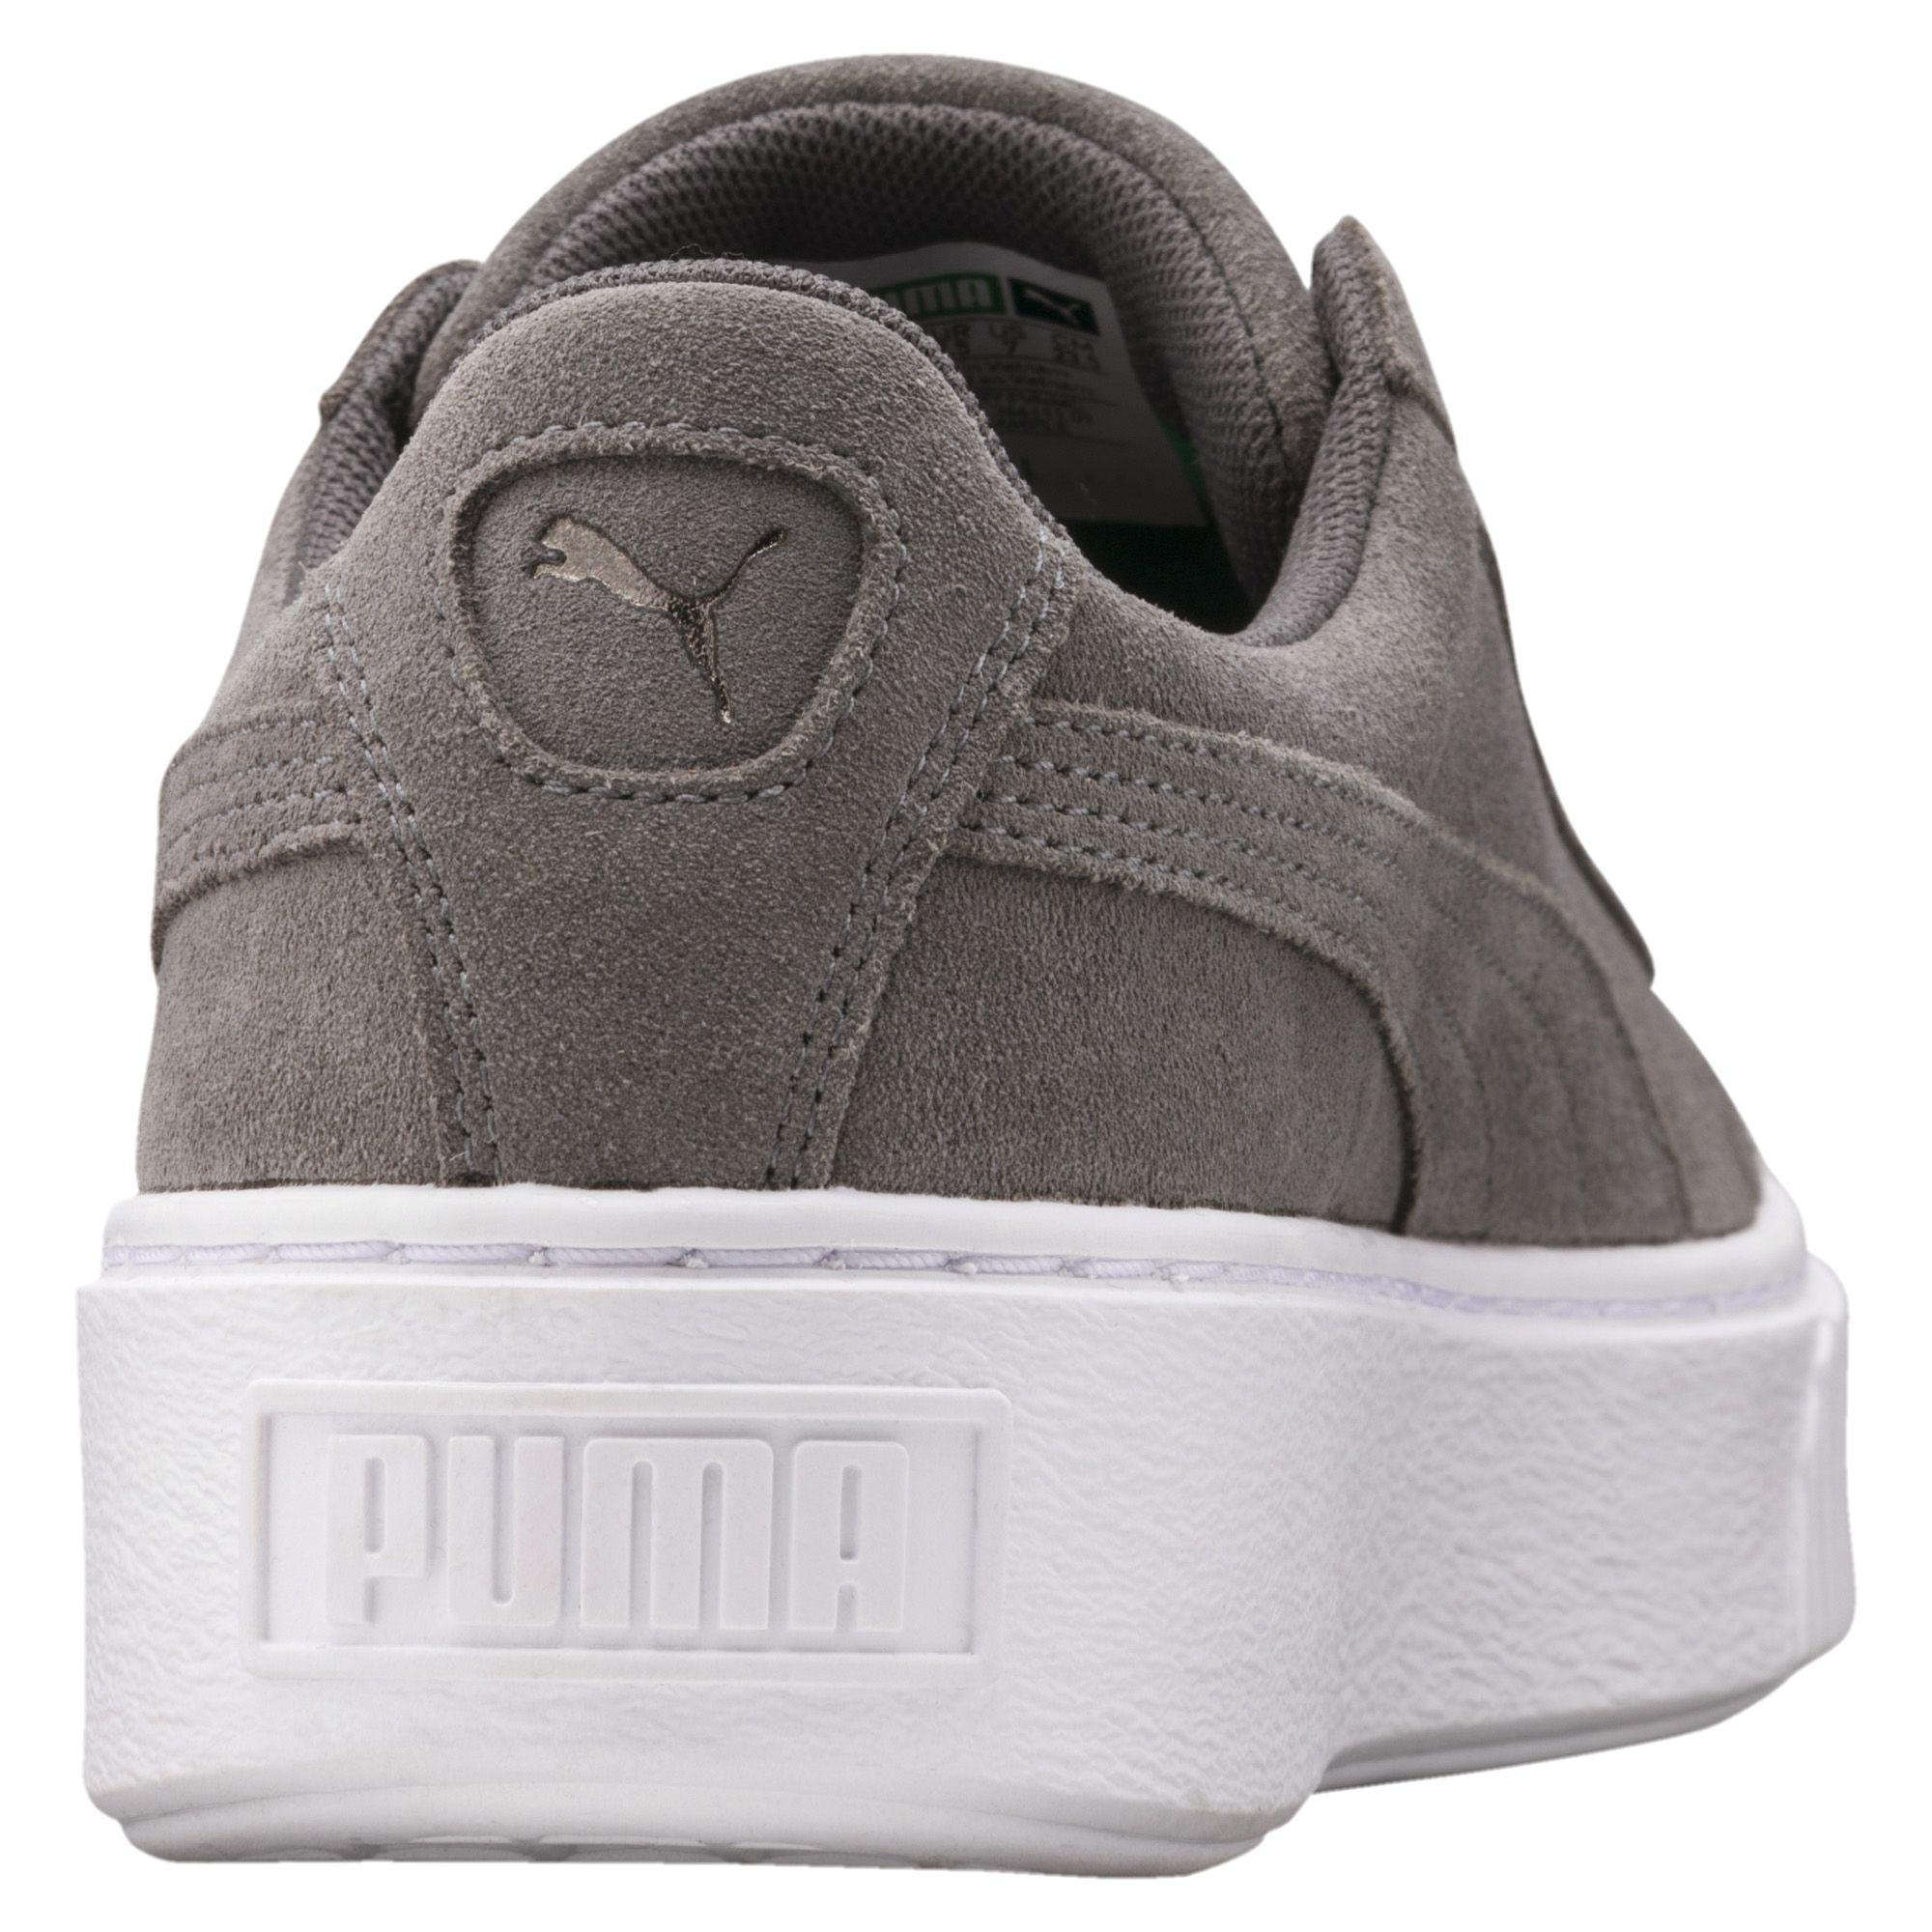 5eb396f13e08 Lyst - PUMA Suede Platform Lunar Lux Women s Sneakers in Gray